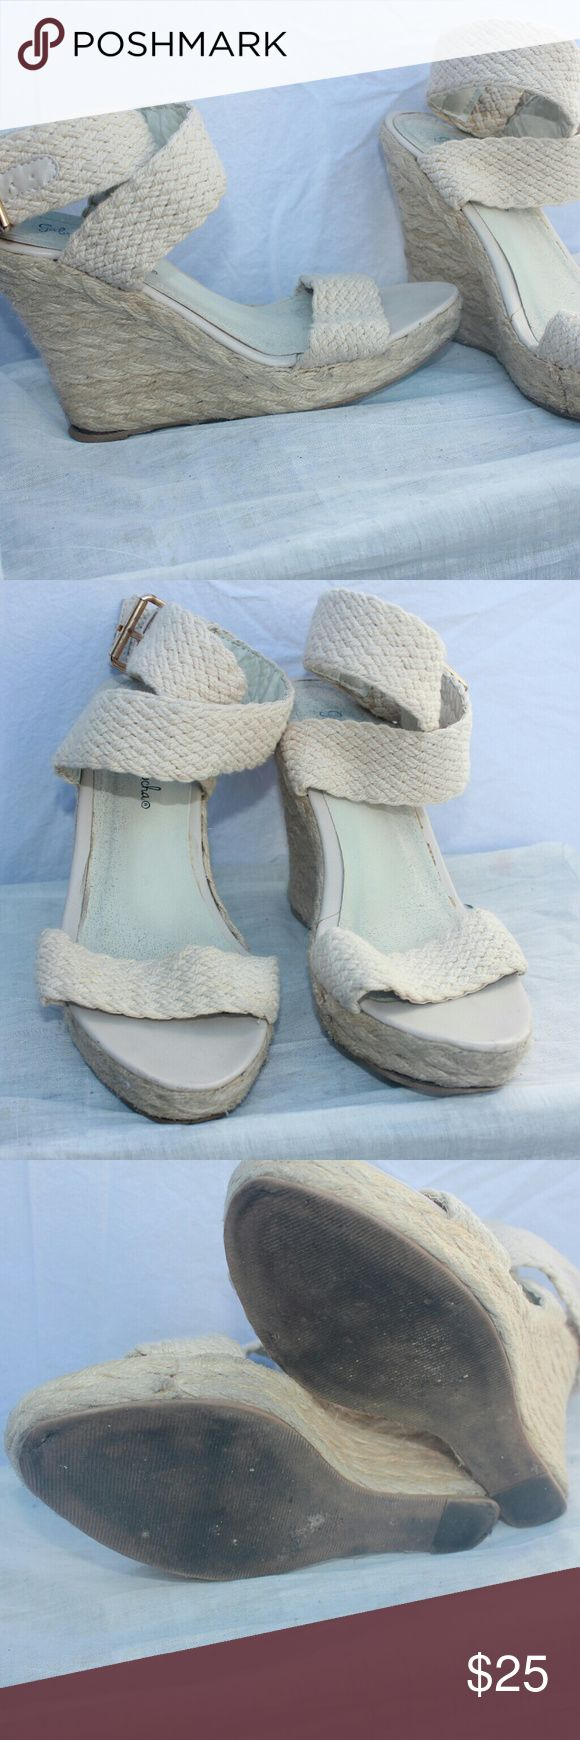 Gabriella Rocha wedges Good condition Gabriella Rocha Shoes Wedges